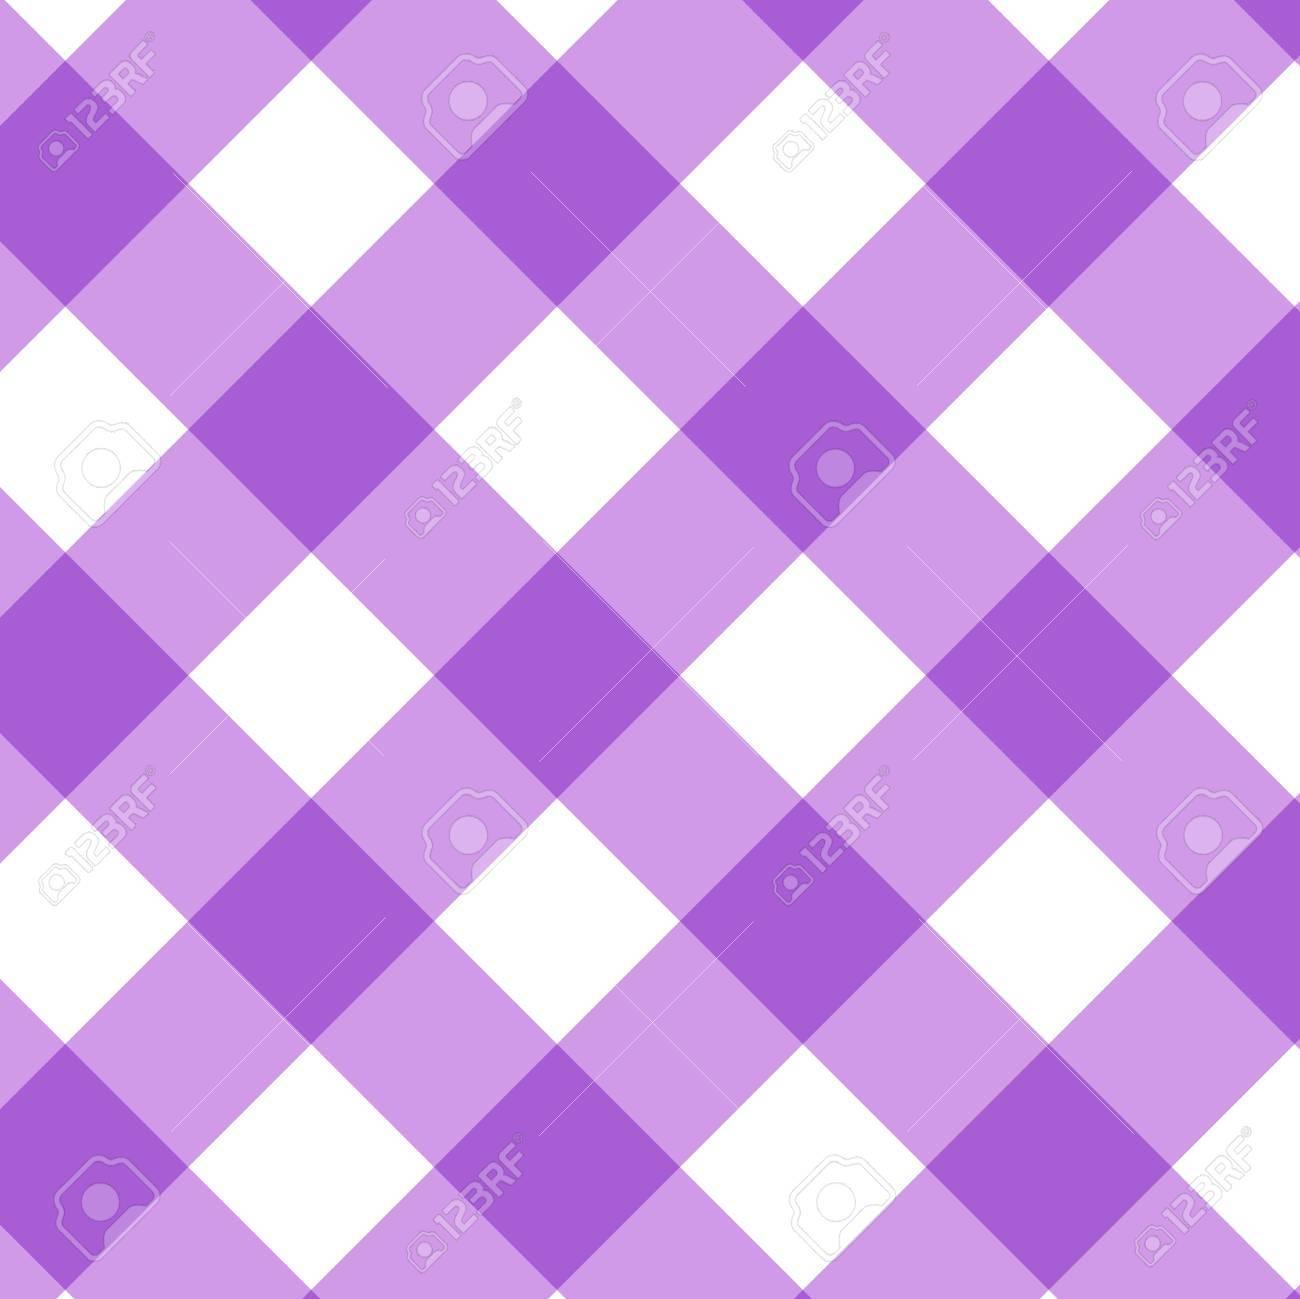 Tartan Plaid Seamless Pattern. Kitchen Checkered Purple Tablecloth Napkin  Fabric Background. Stock Vector